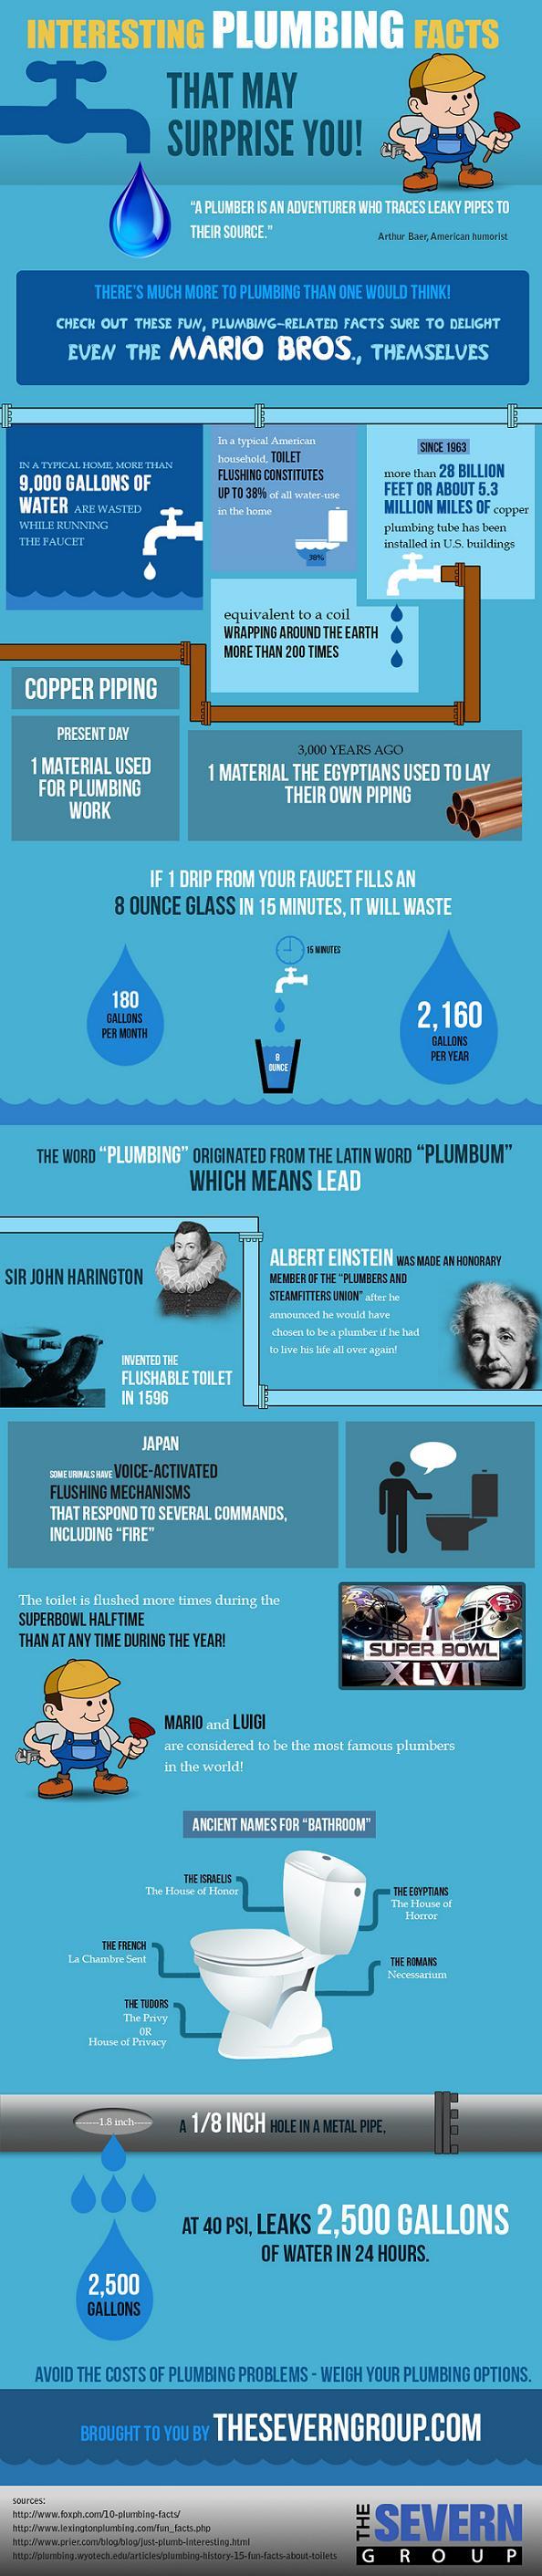 Interesting Plumbing Facts That May Surprise You Plumbing Plumbing Installation Plumber Humor